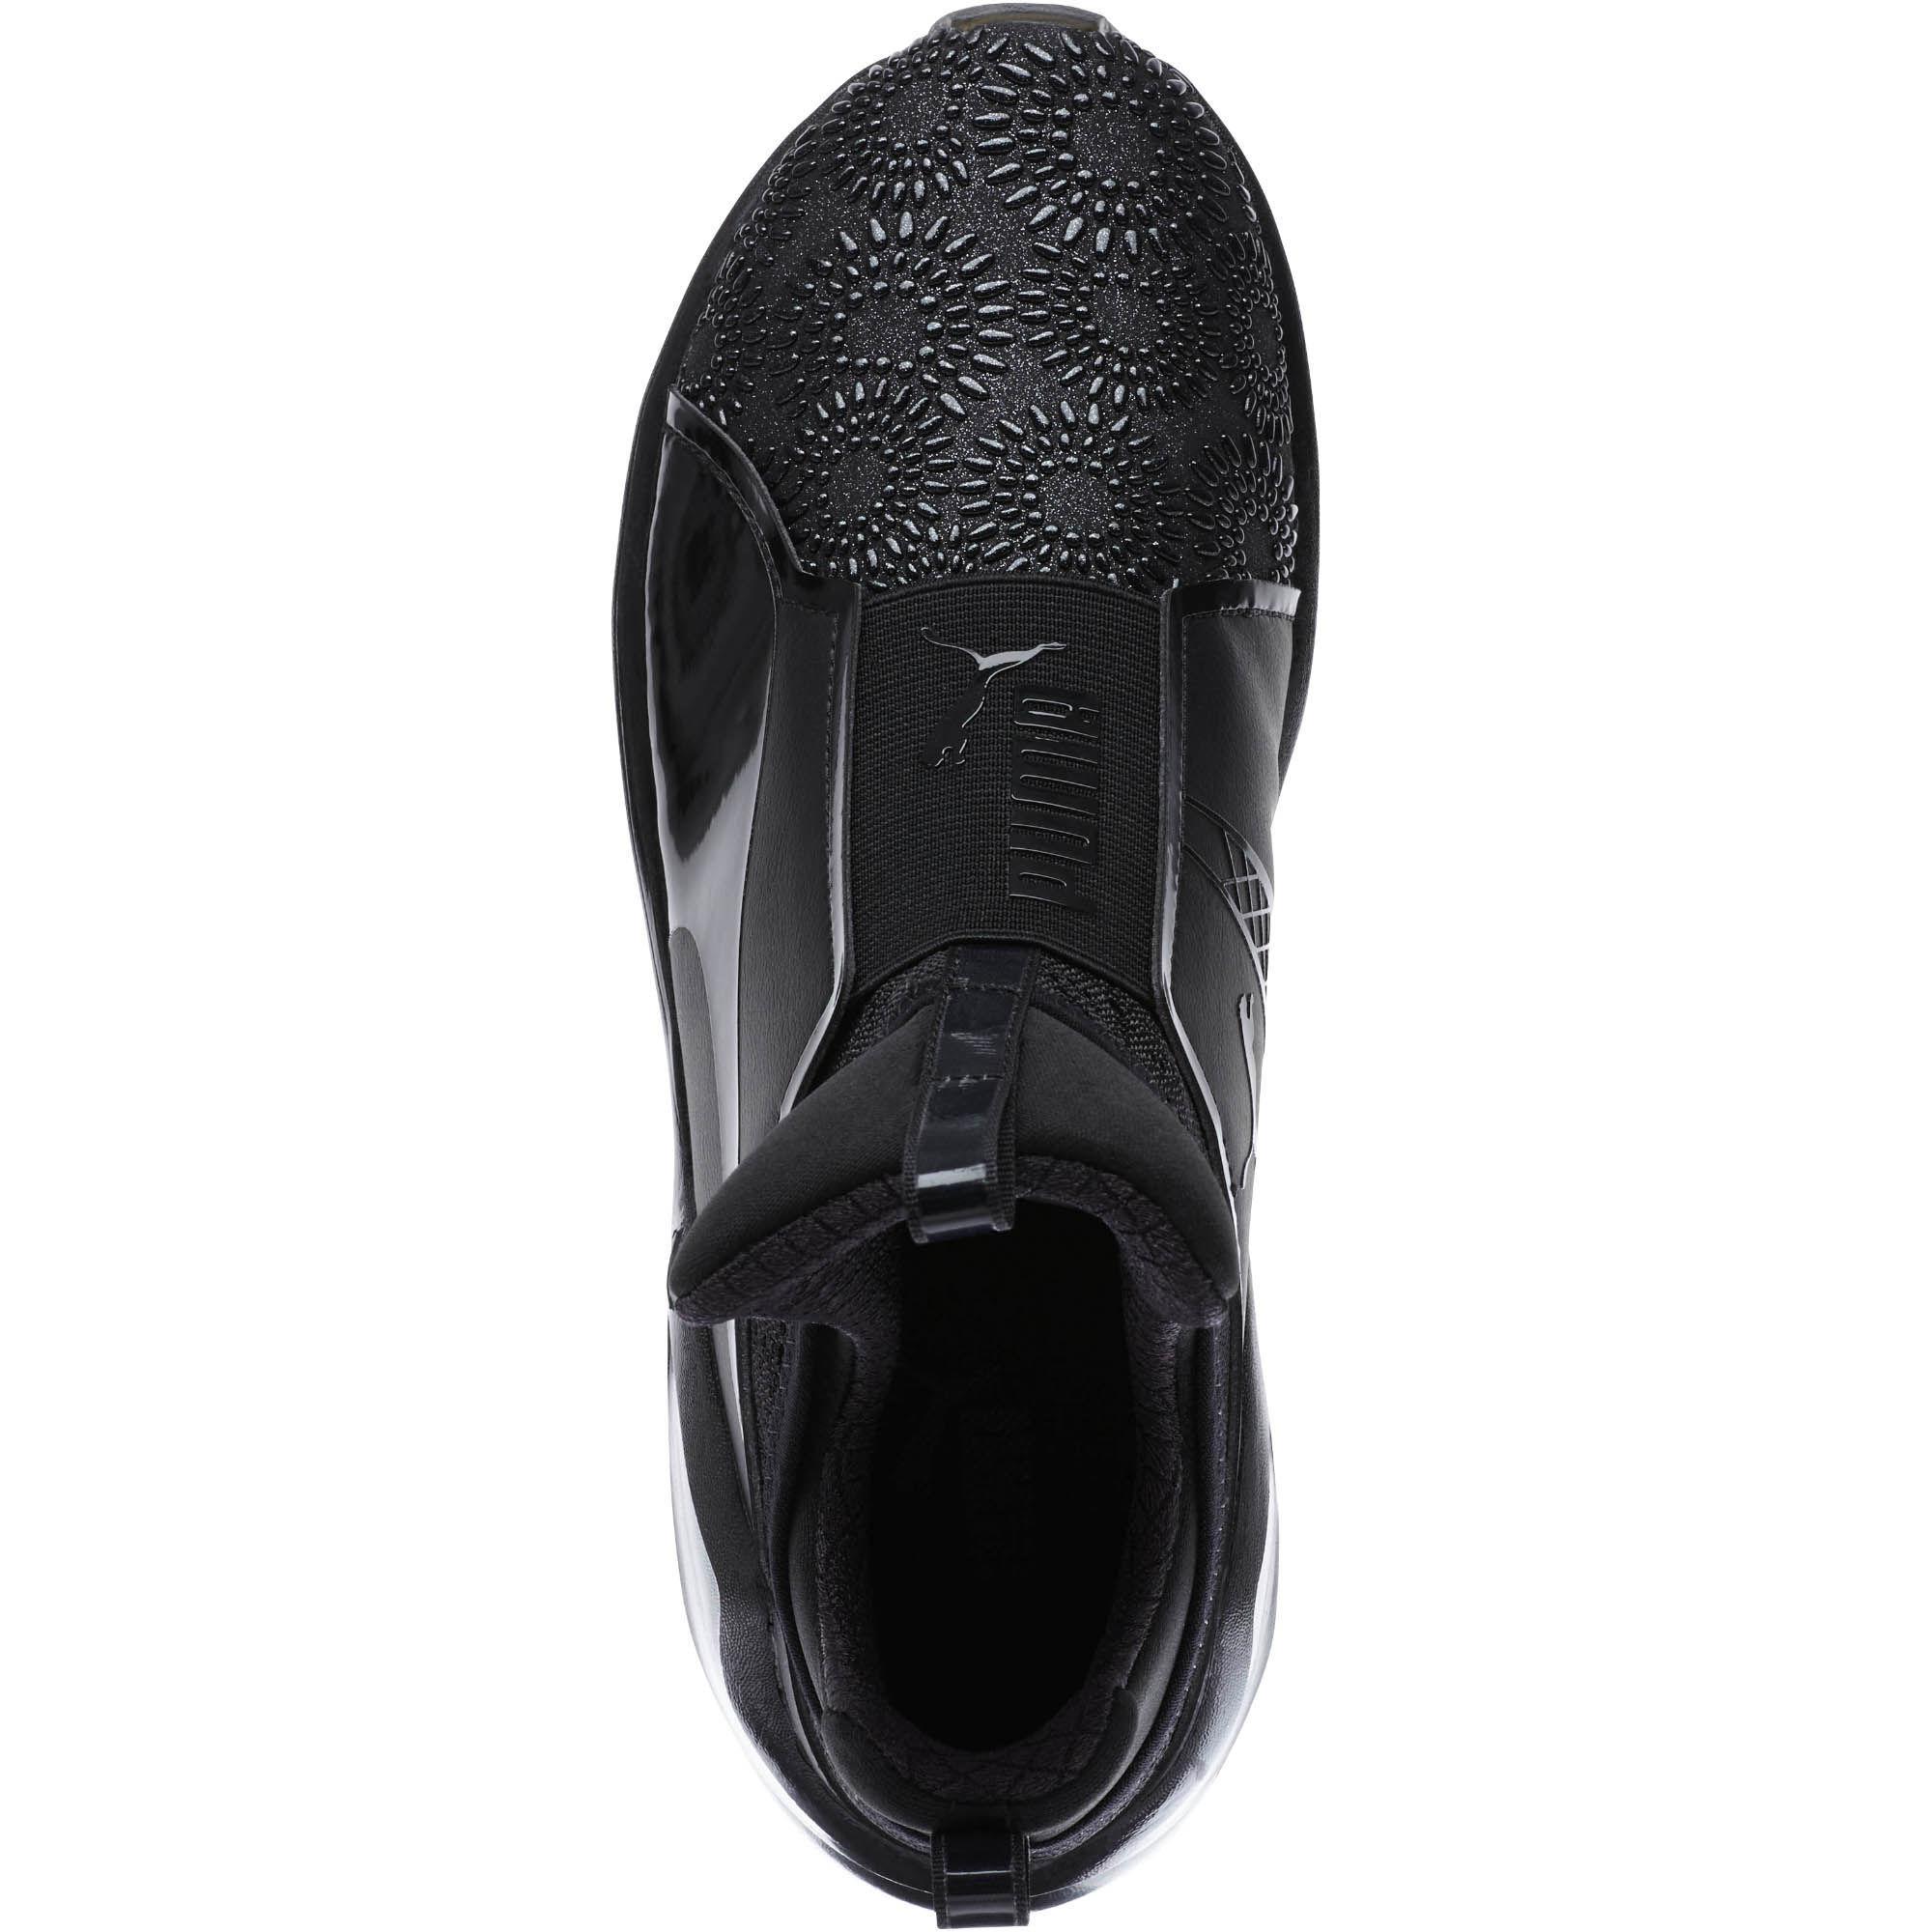 c3fa306e1055 Lyst - PUMA Fierce Kurim Women s Training Shoes